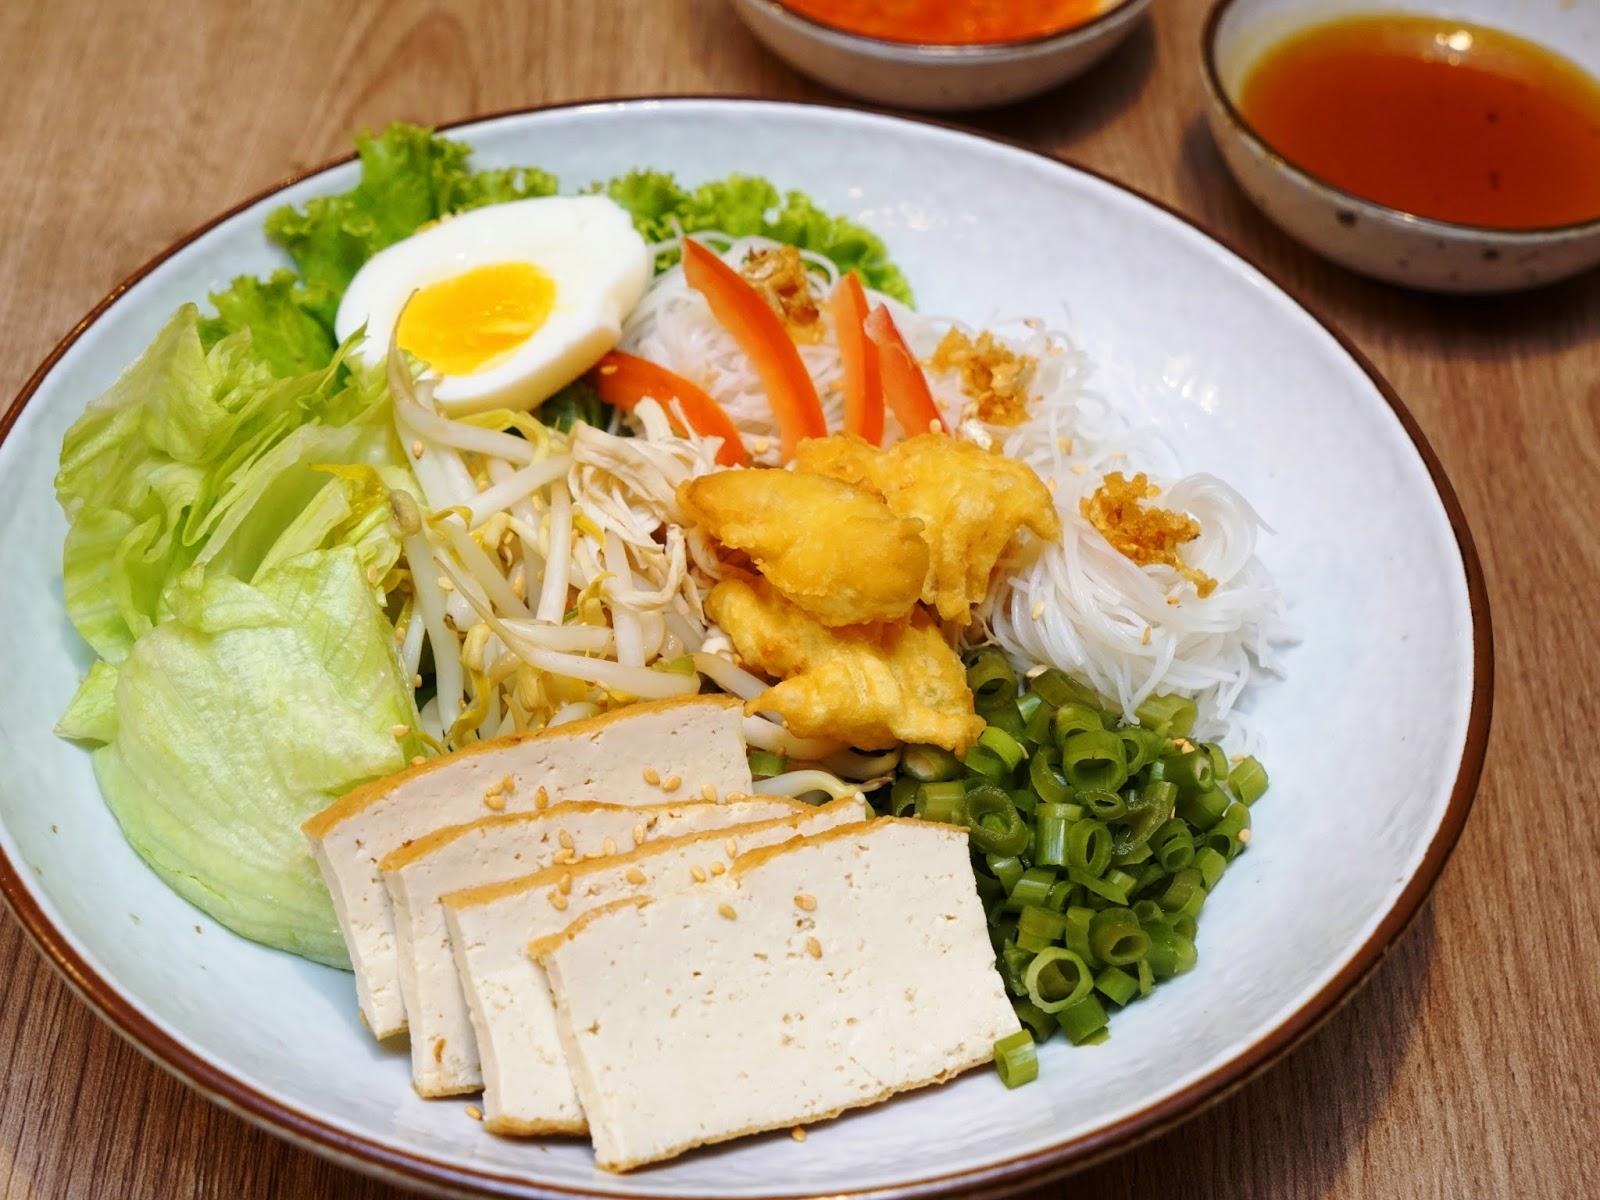 Pinkypiggu Basil Thai Kitchen Paragon Orchard Affordable Delicious Thai Food In Beautiful Garden Setting